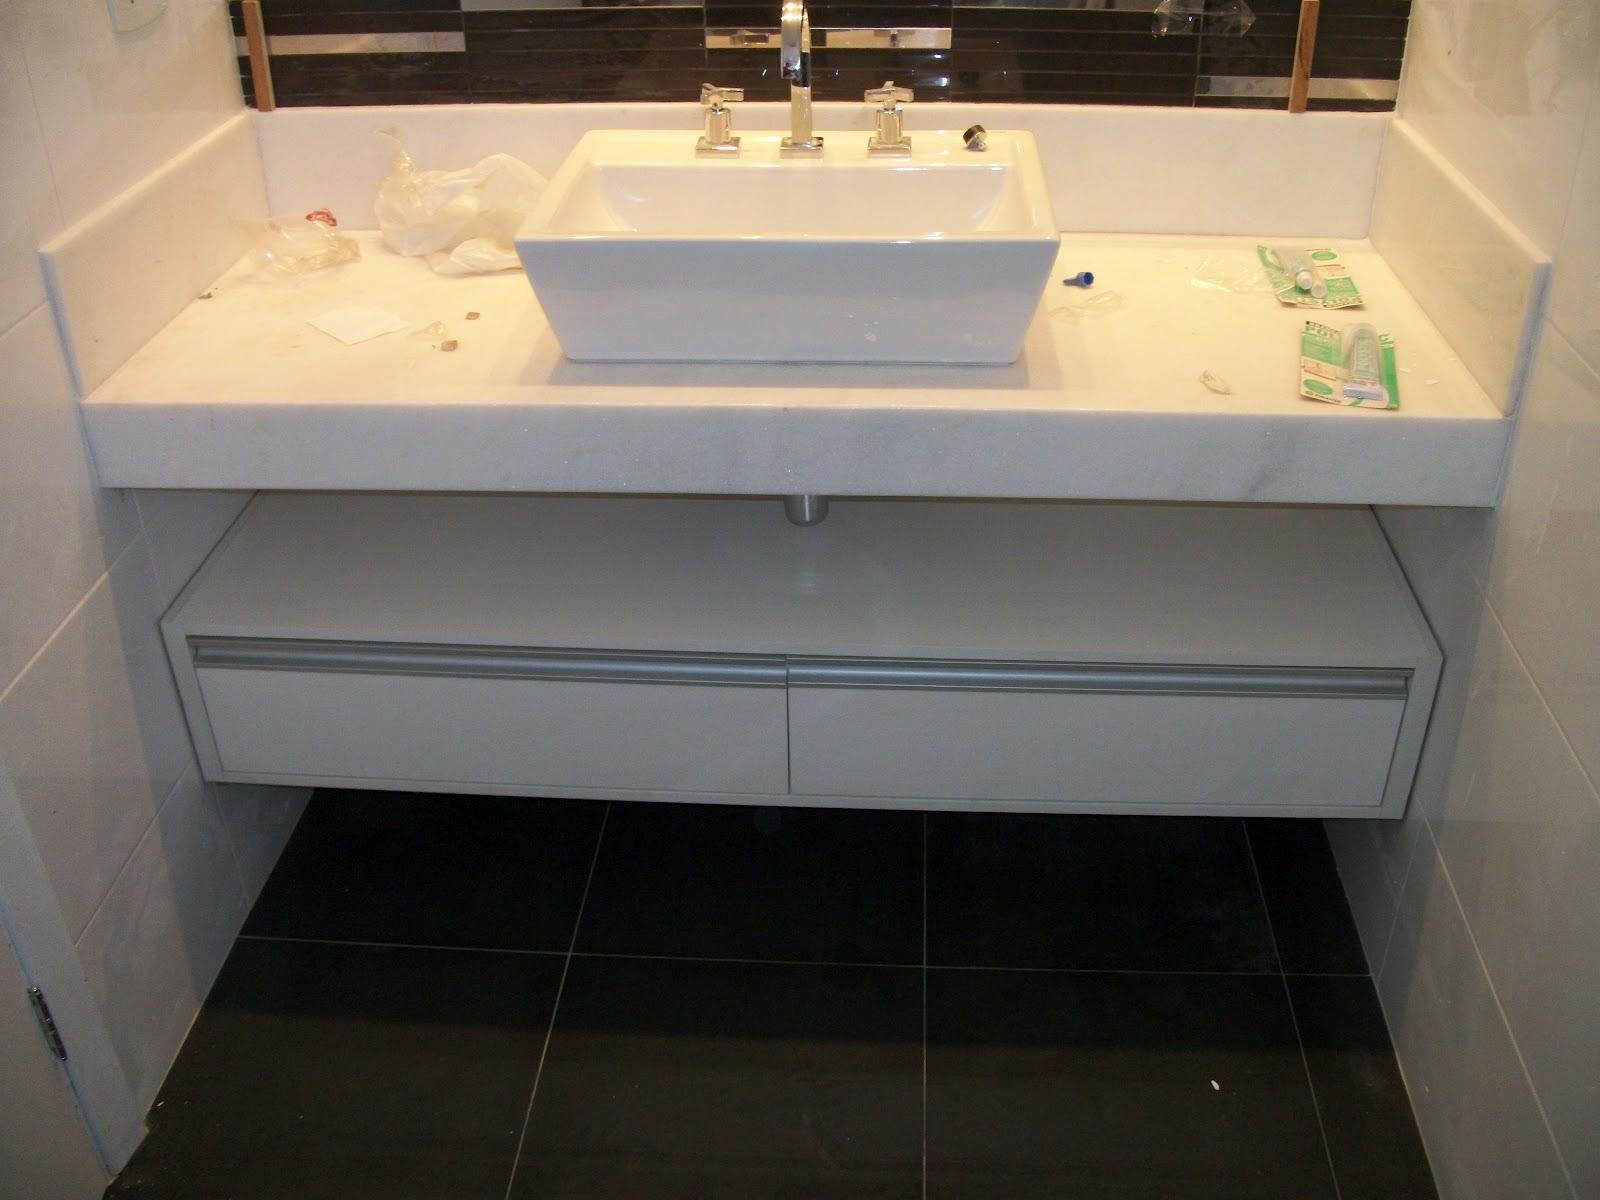 MÓBILE MARCENARIA: gabinetes de banheiro #A97722 1600x1200 Banheiro Com Gabinete